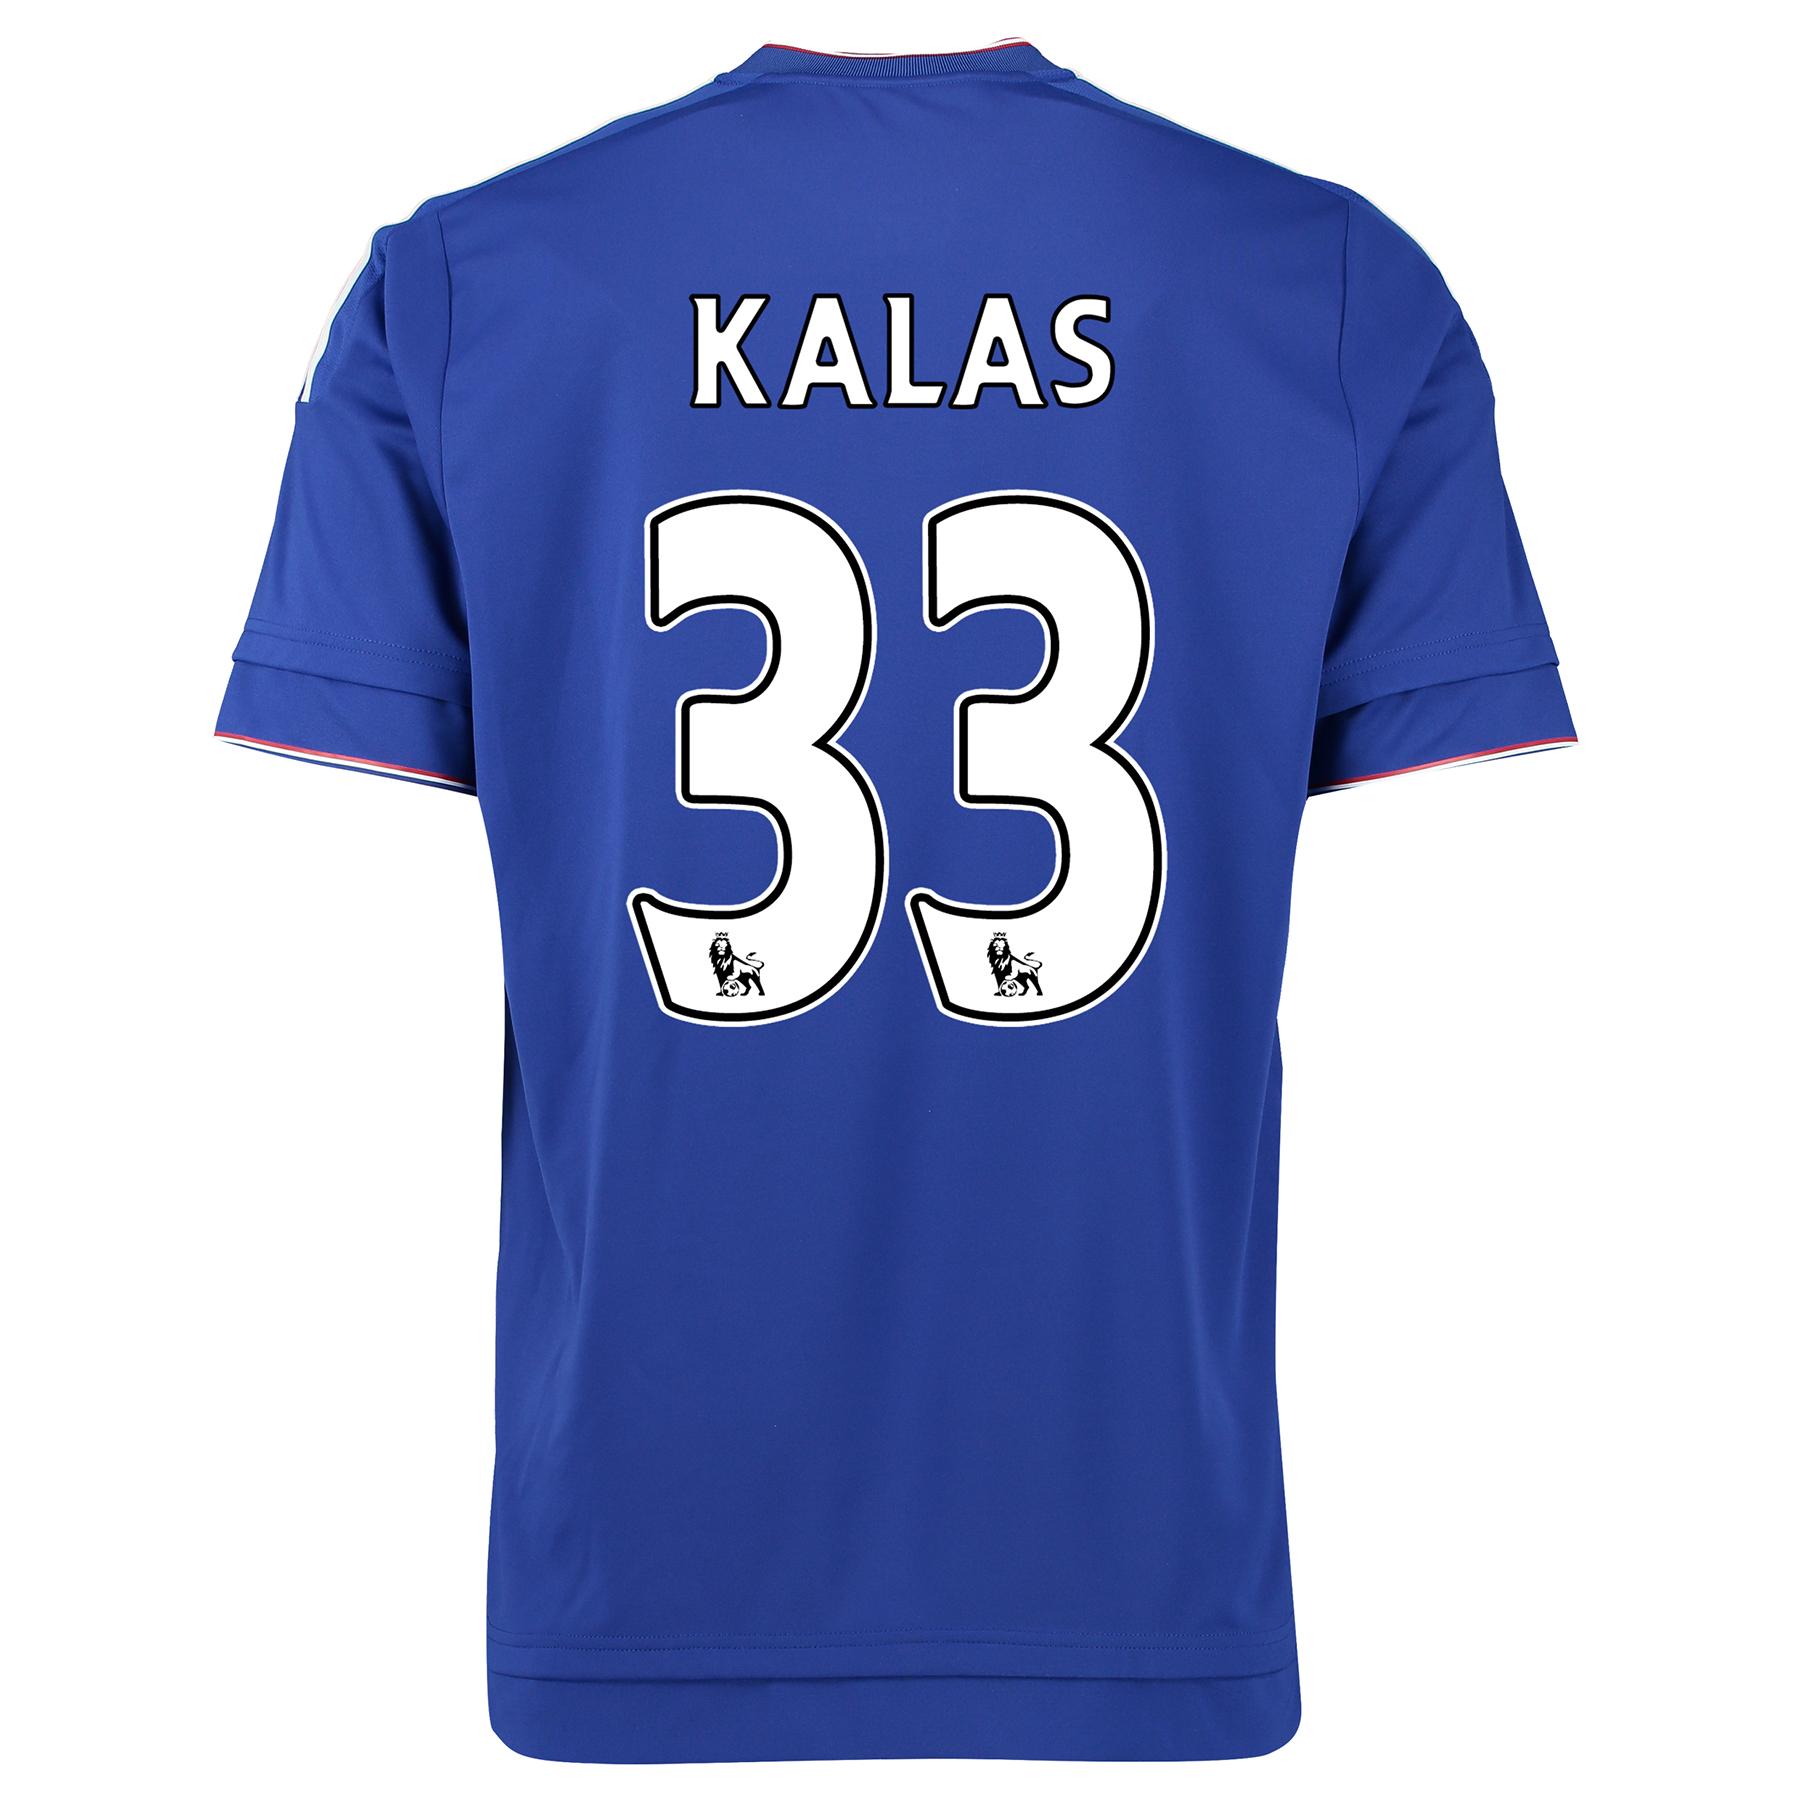 Chelsea Home Shirt 2015/16 Kids Blue with Kalas 33 printing